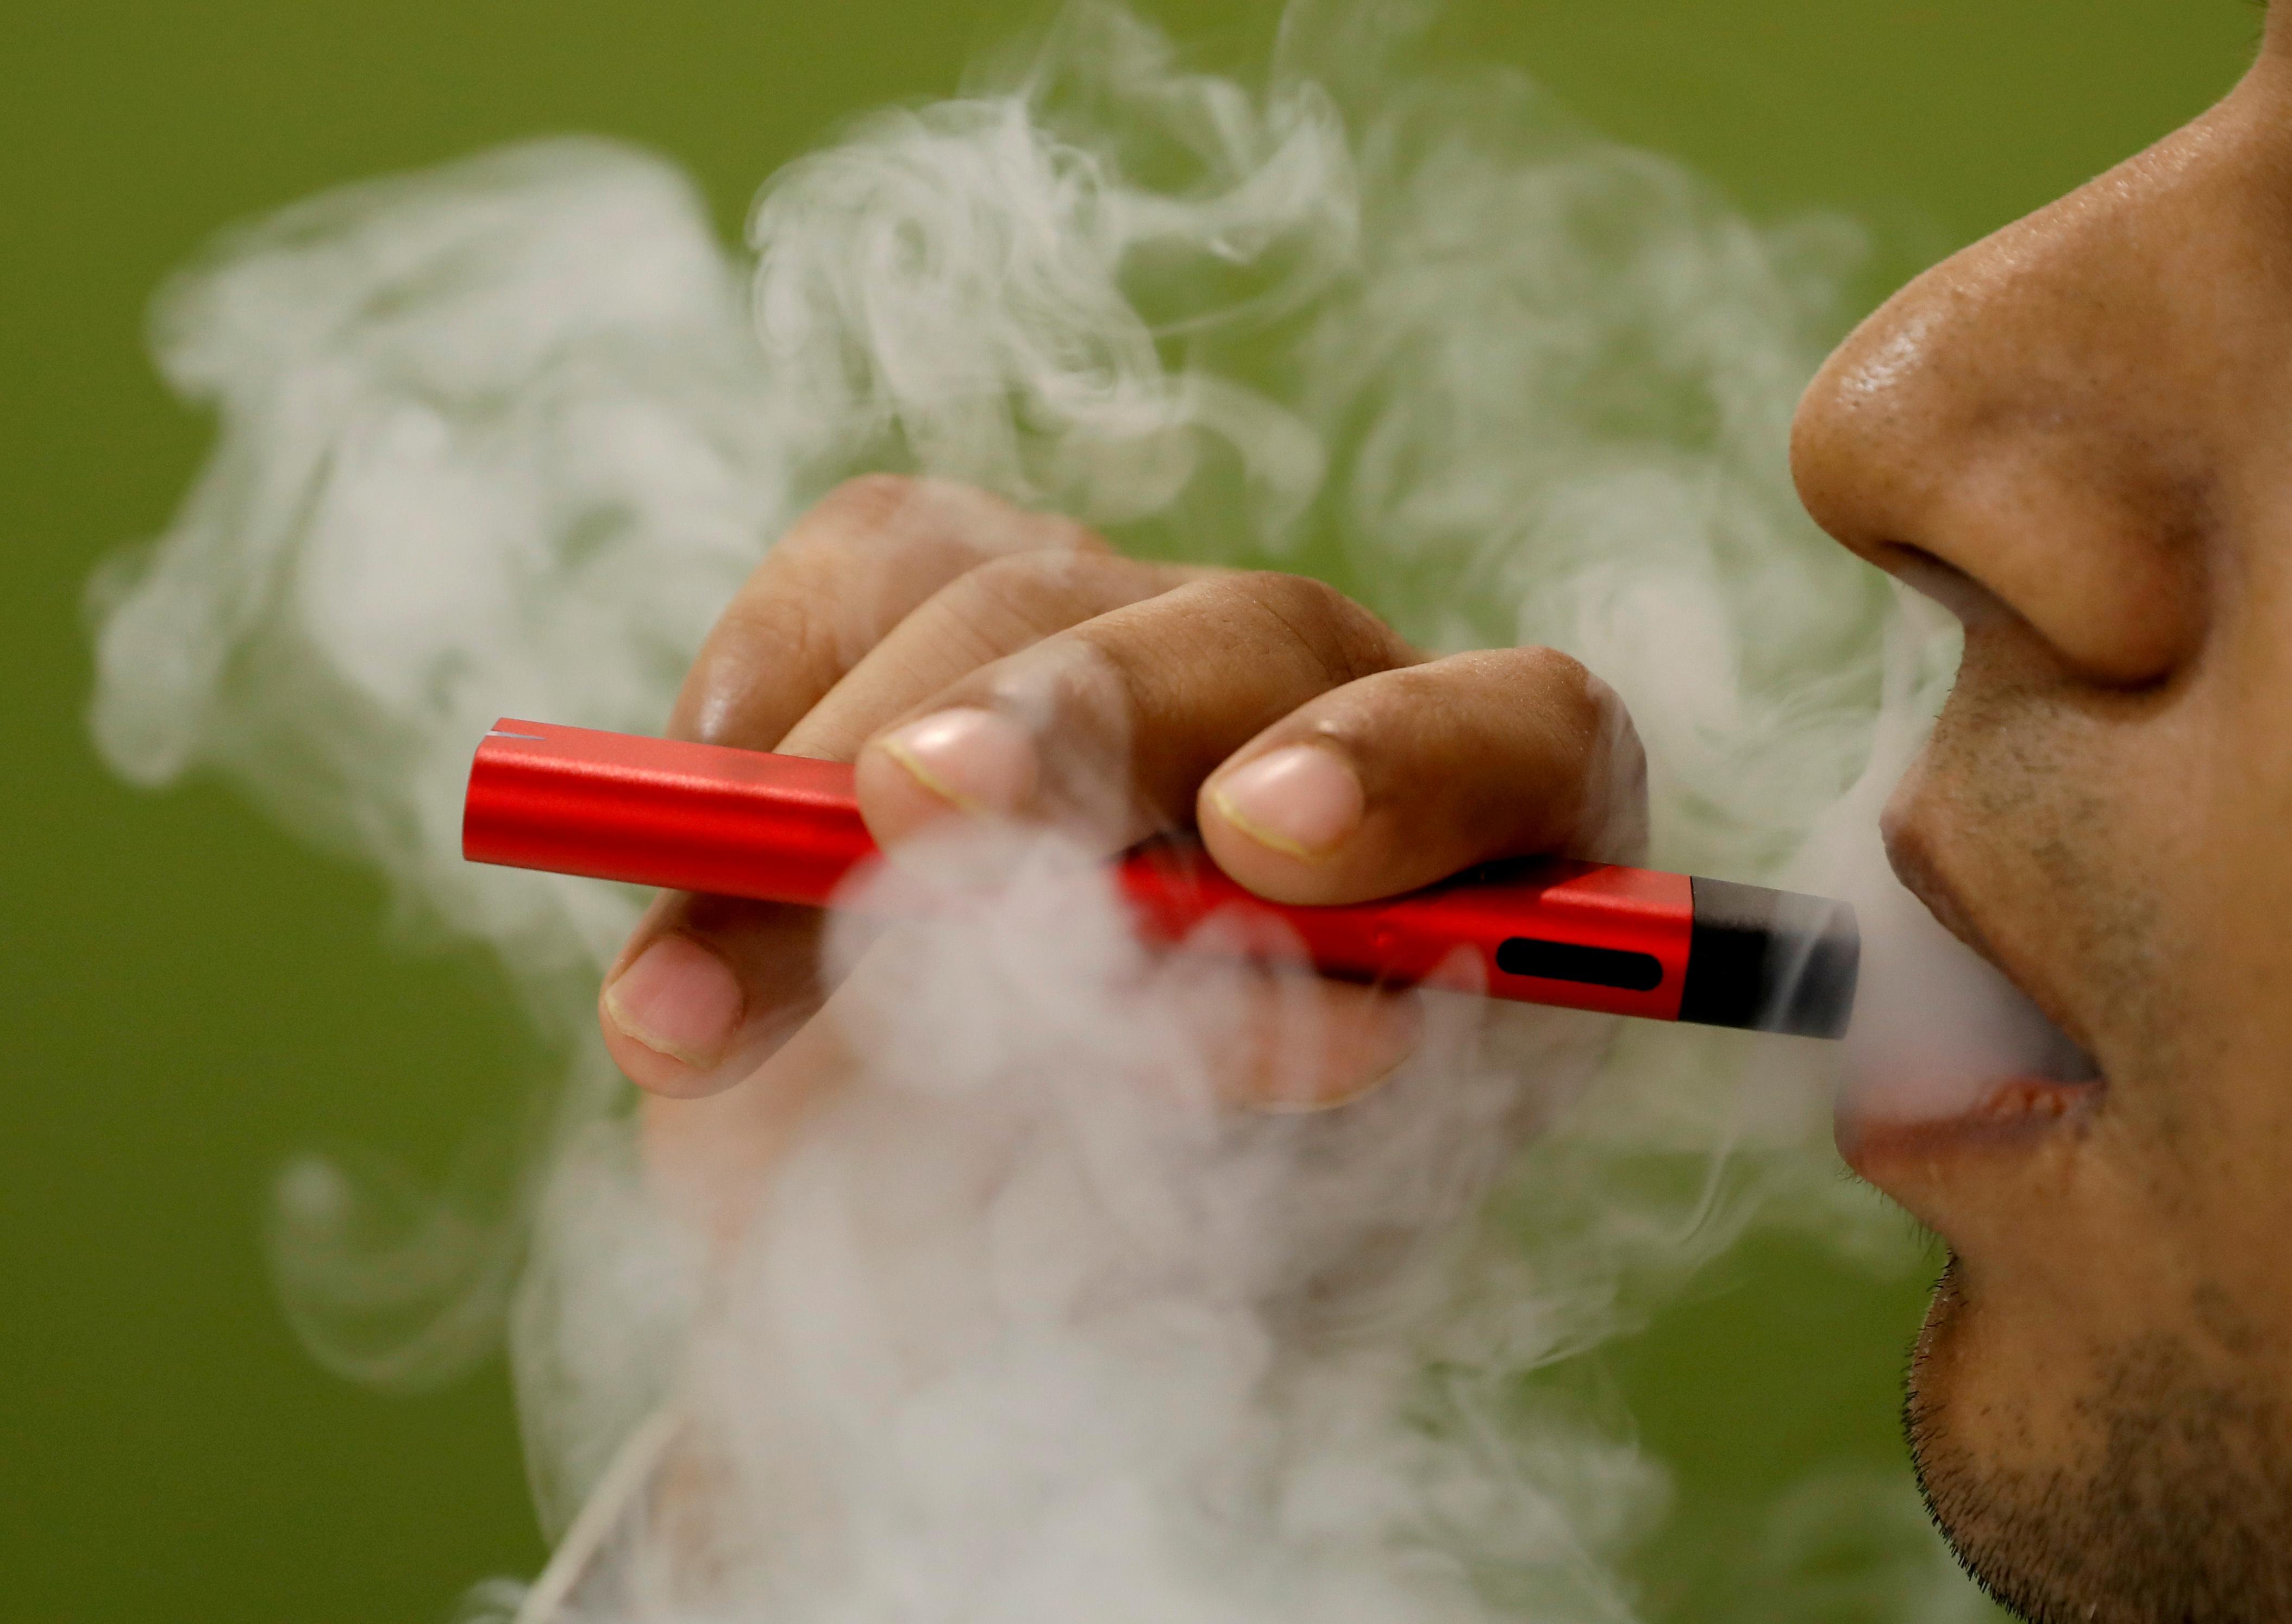 South Korea warns against 'grave threat' from liquid e-cigarettes